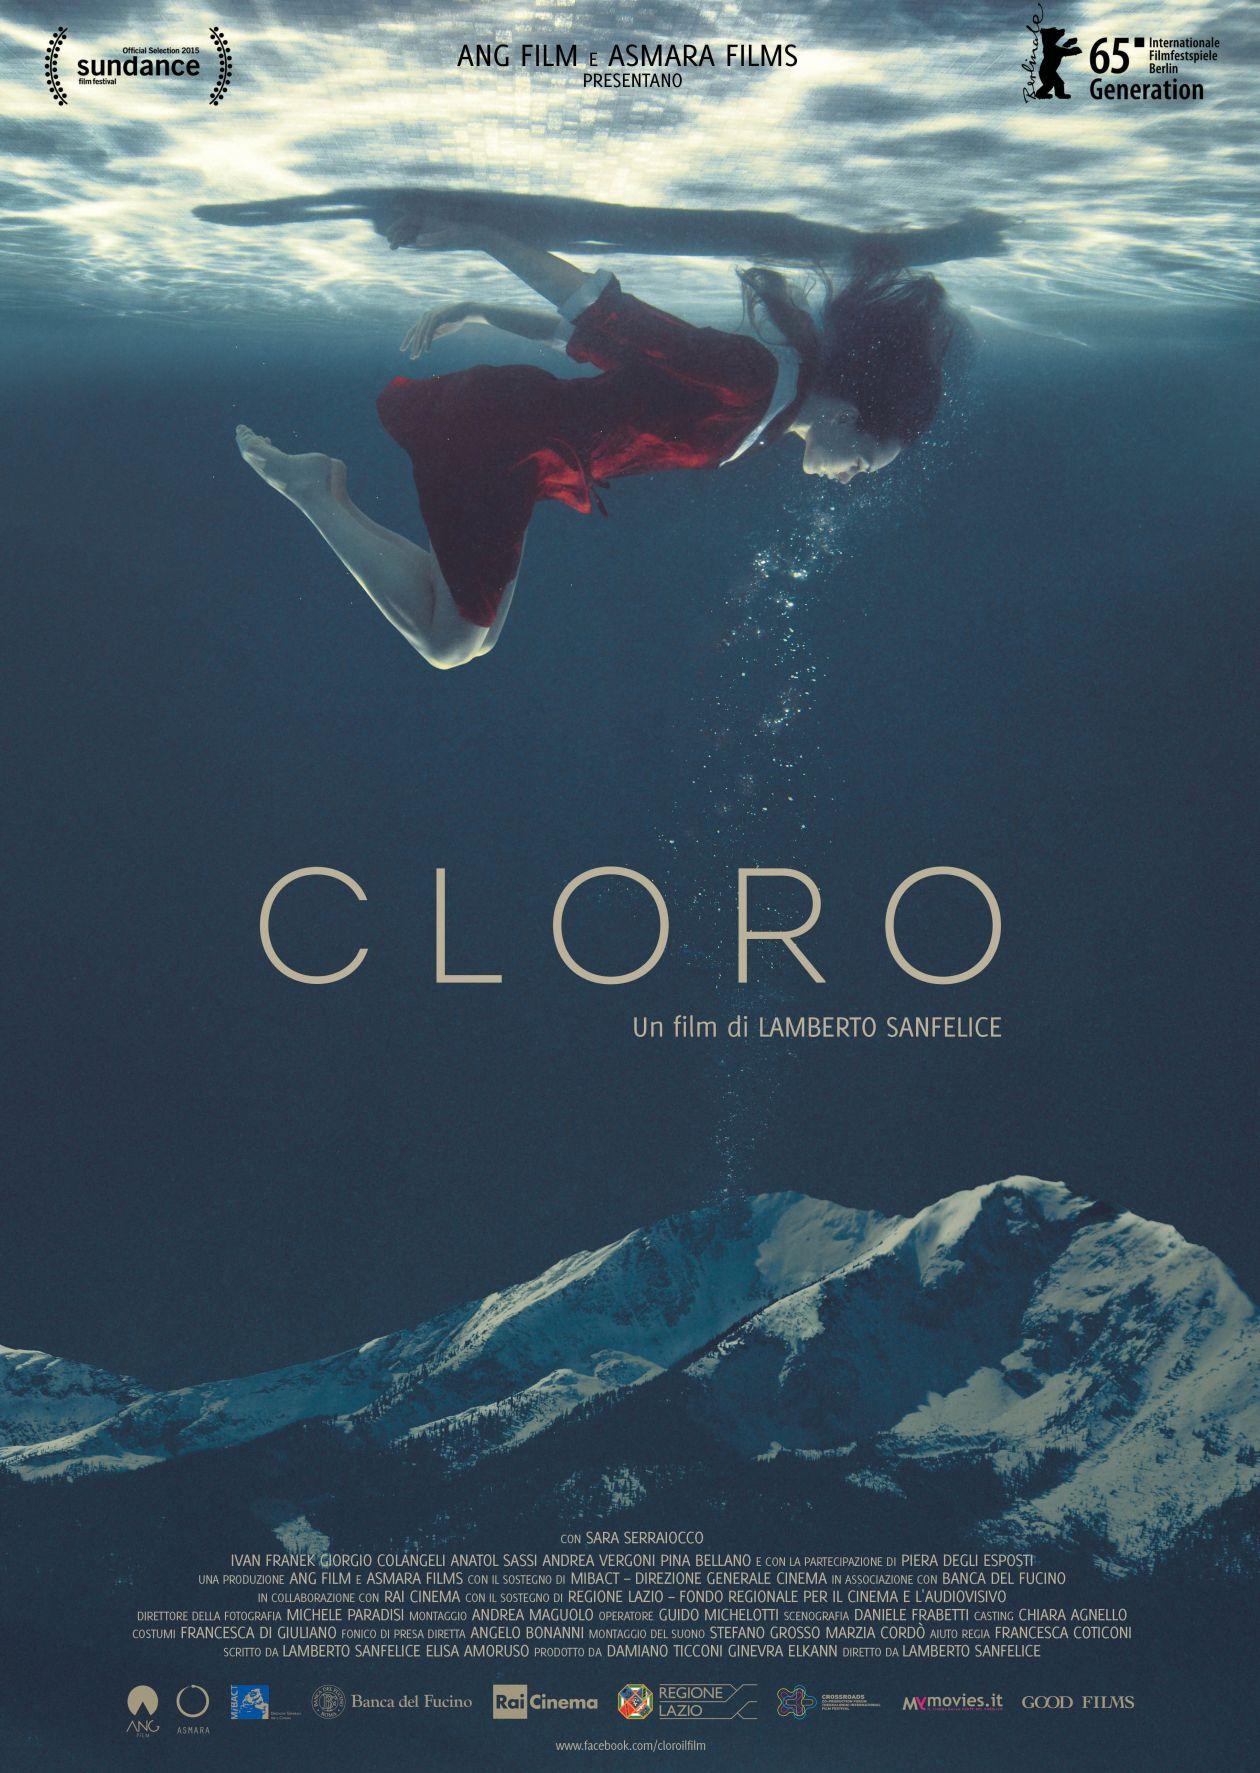 Sara Serraiocco actress / CLORO / Lamberto Sanfelice 2015 Movie Poster Affiche film